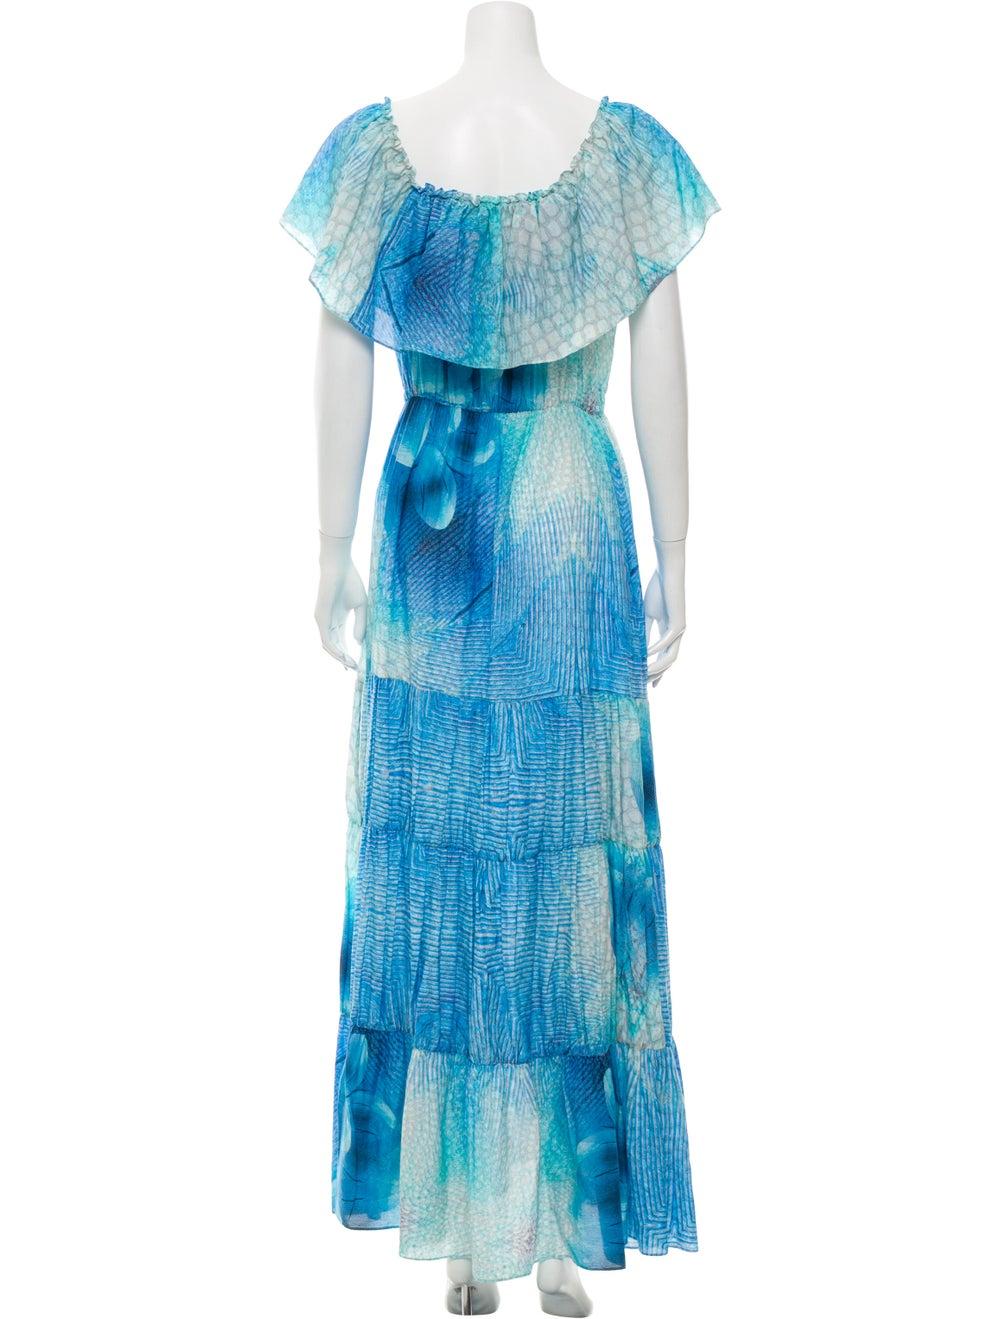 Athena Procopiou Printed Long Dress Blue - image 3